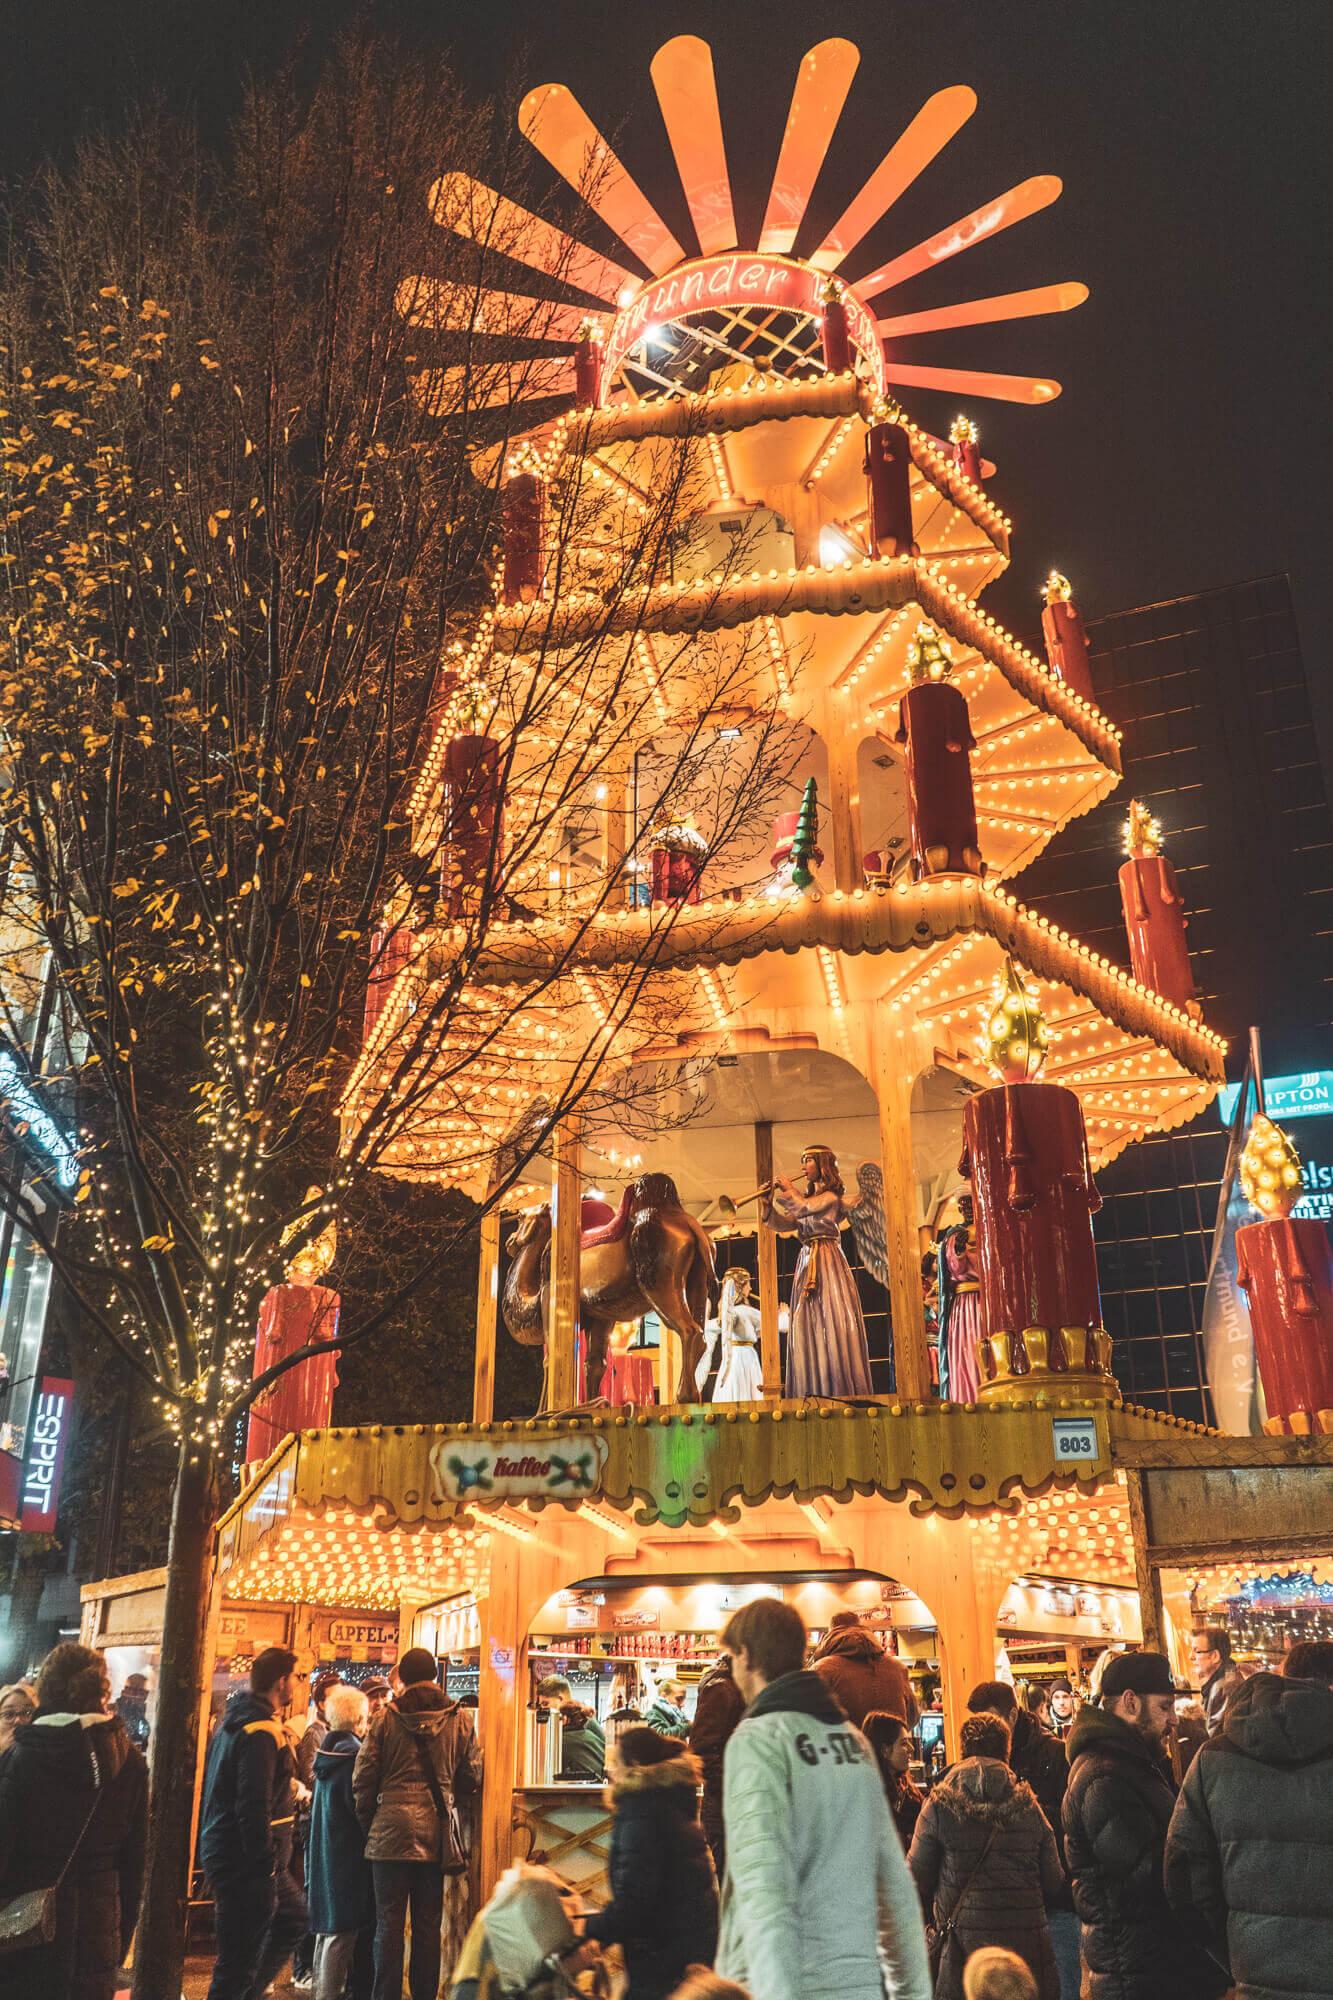 Dortmund Christmas Market Pyramid